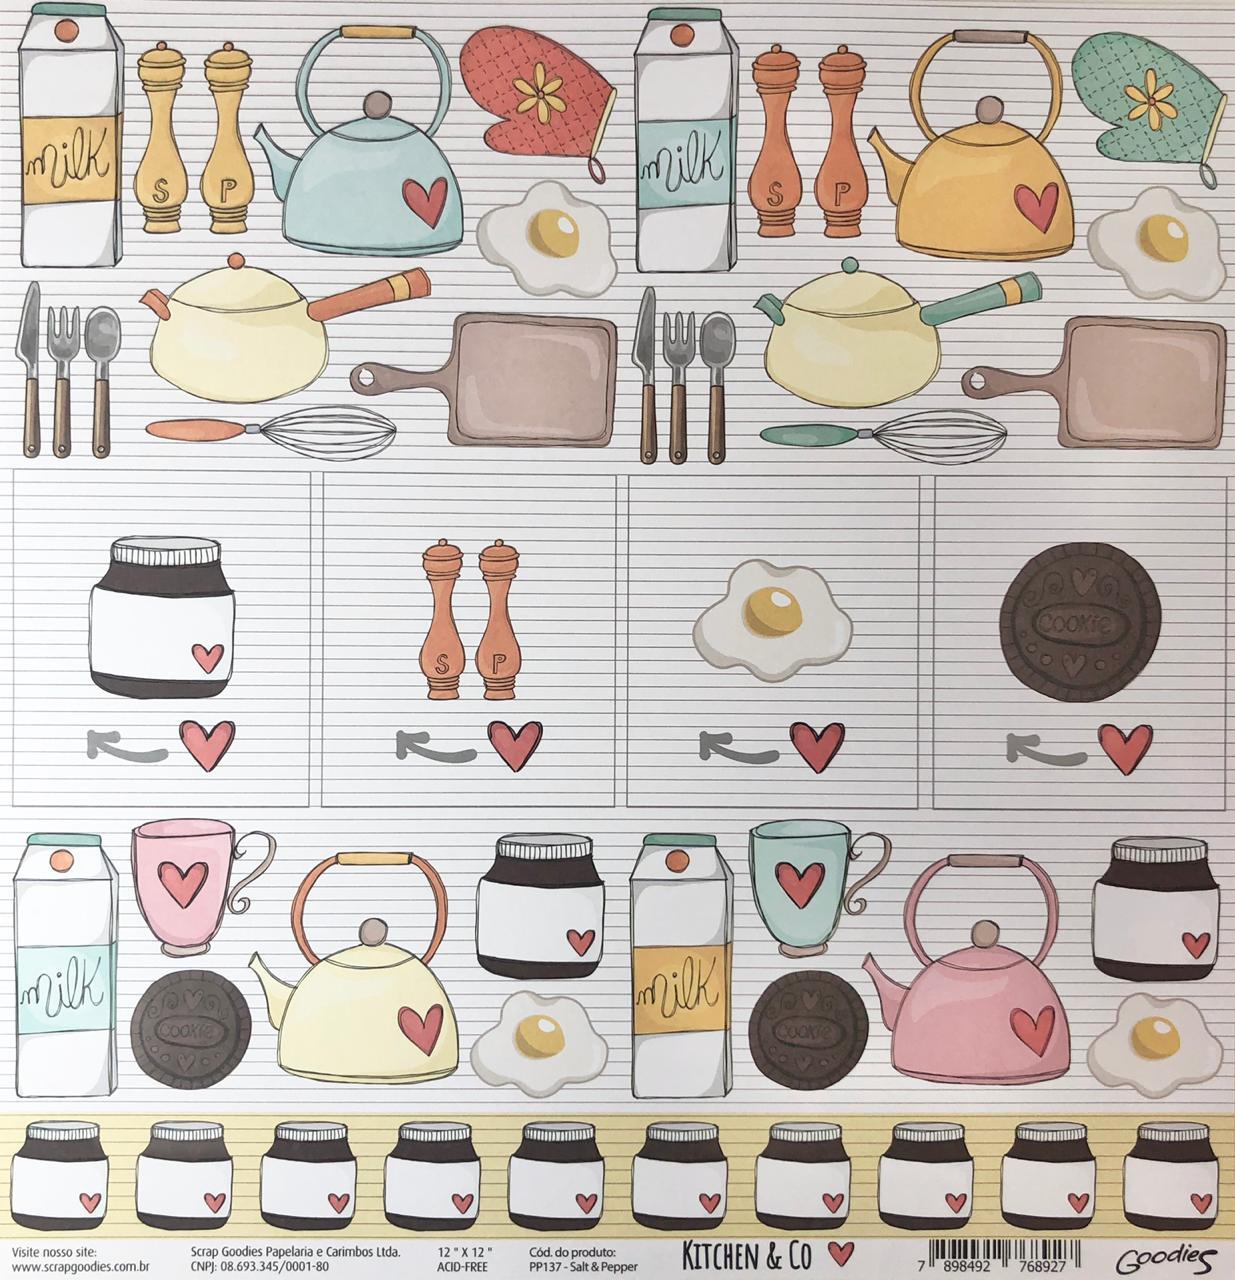 Papel Scrap - Salt & Pepper - Coleção Kitchen & Co - Goodies (PP137)